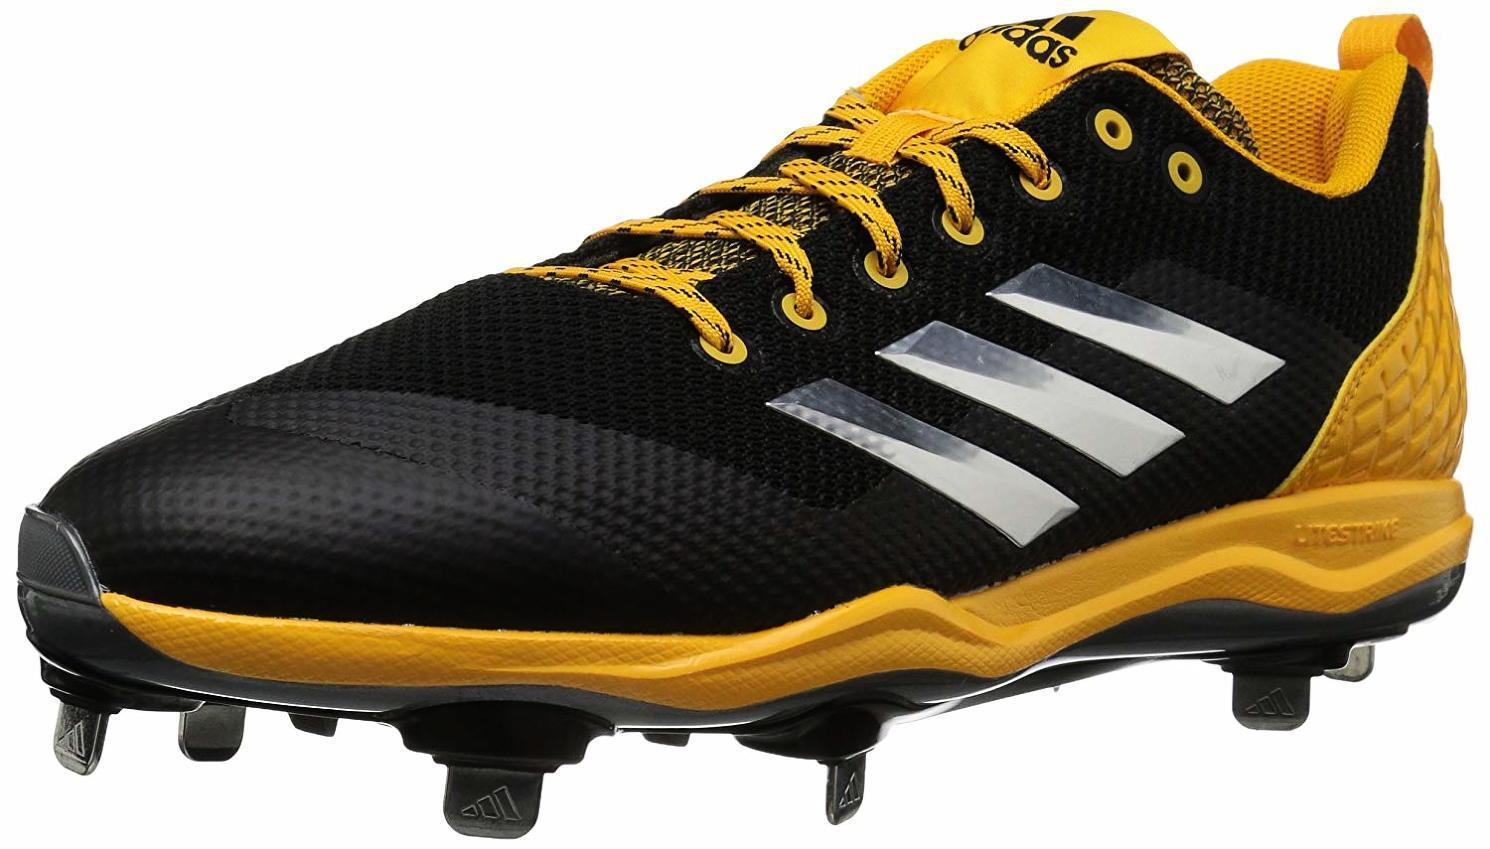 Adidas Originals Men's PowerAlley 5 Baseball shoes - Choose SZ color